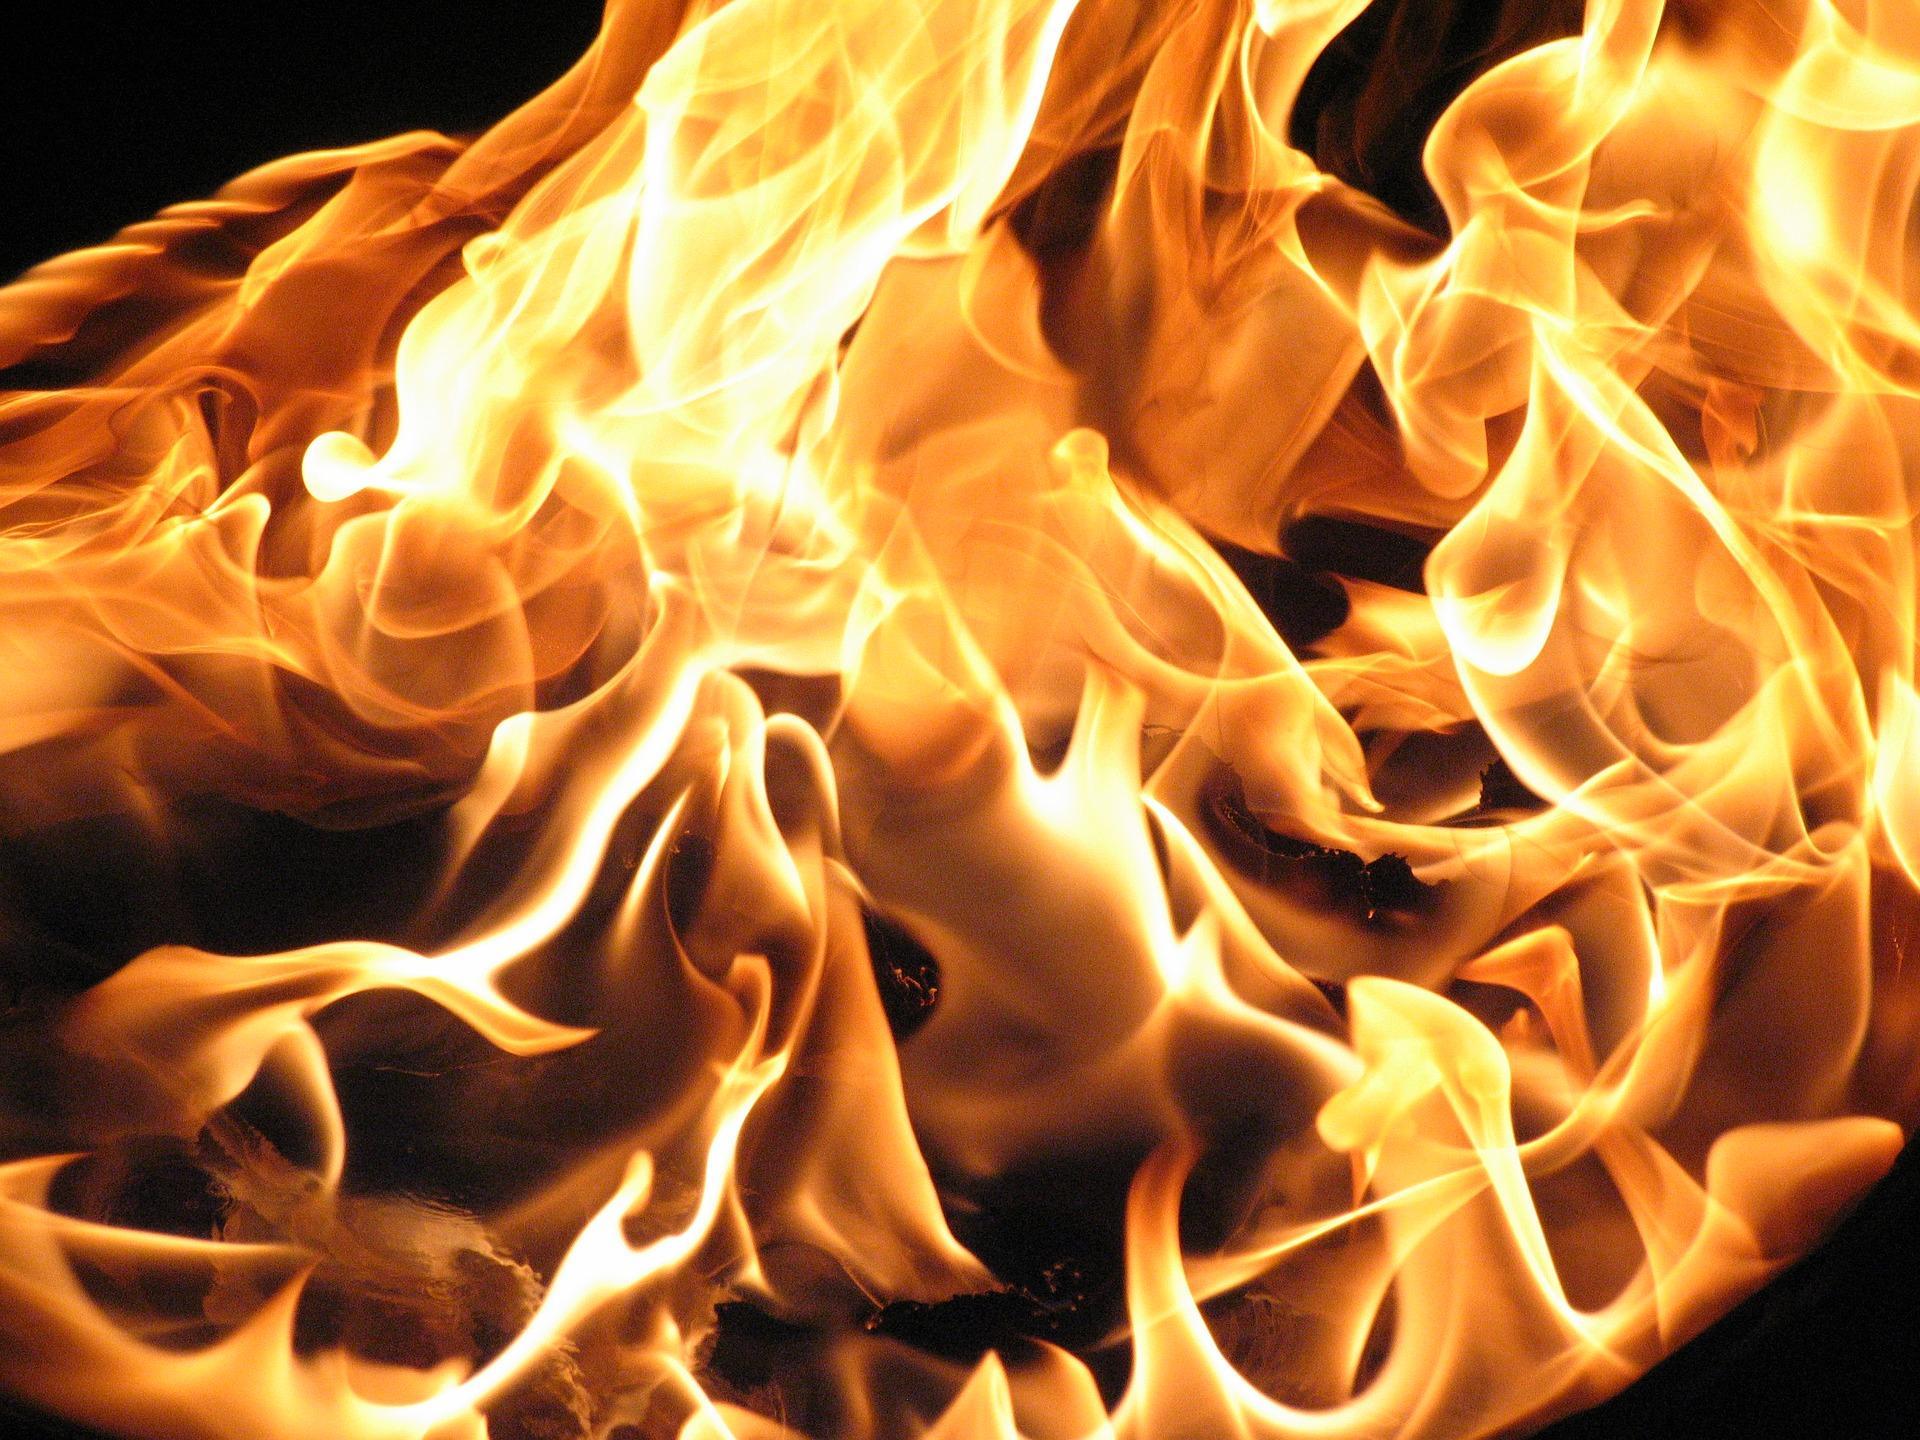 fire 1712030 1920 - O PEKLE